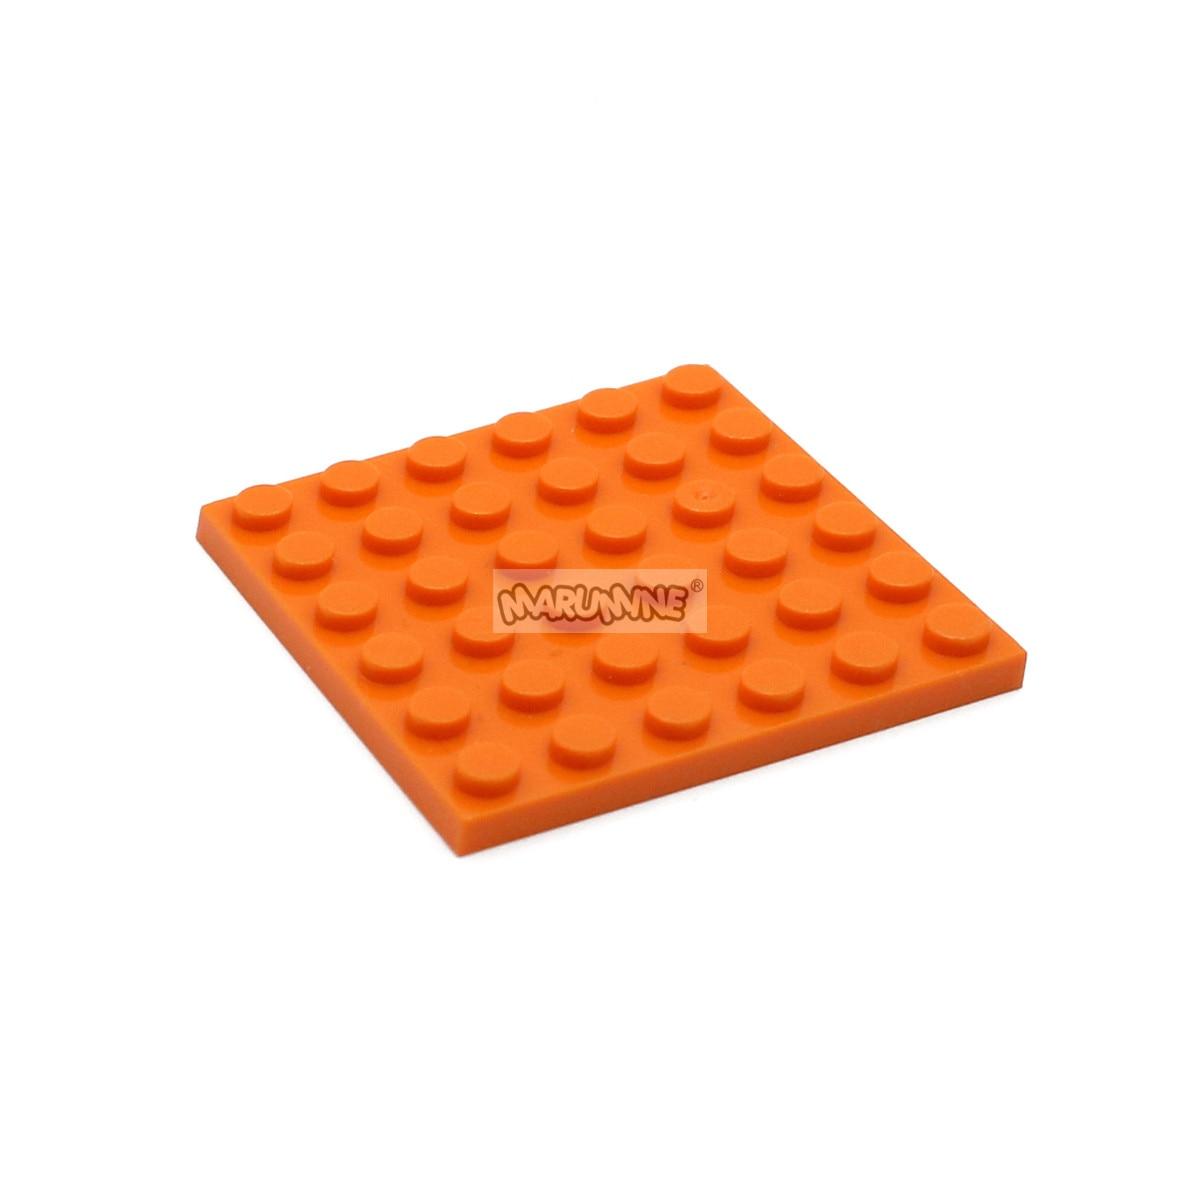 Lego 2 Tan 6x6 base plate NEW